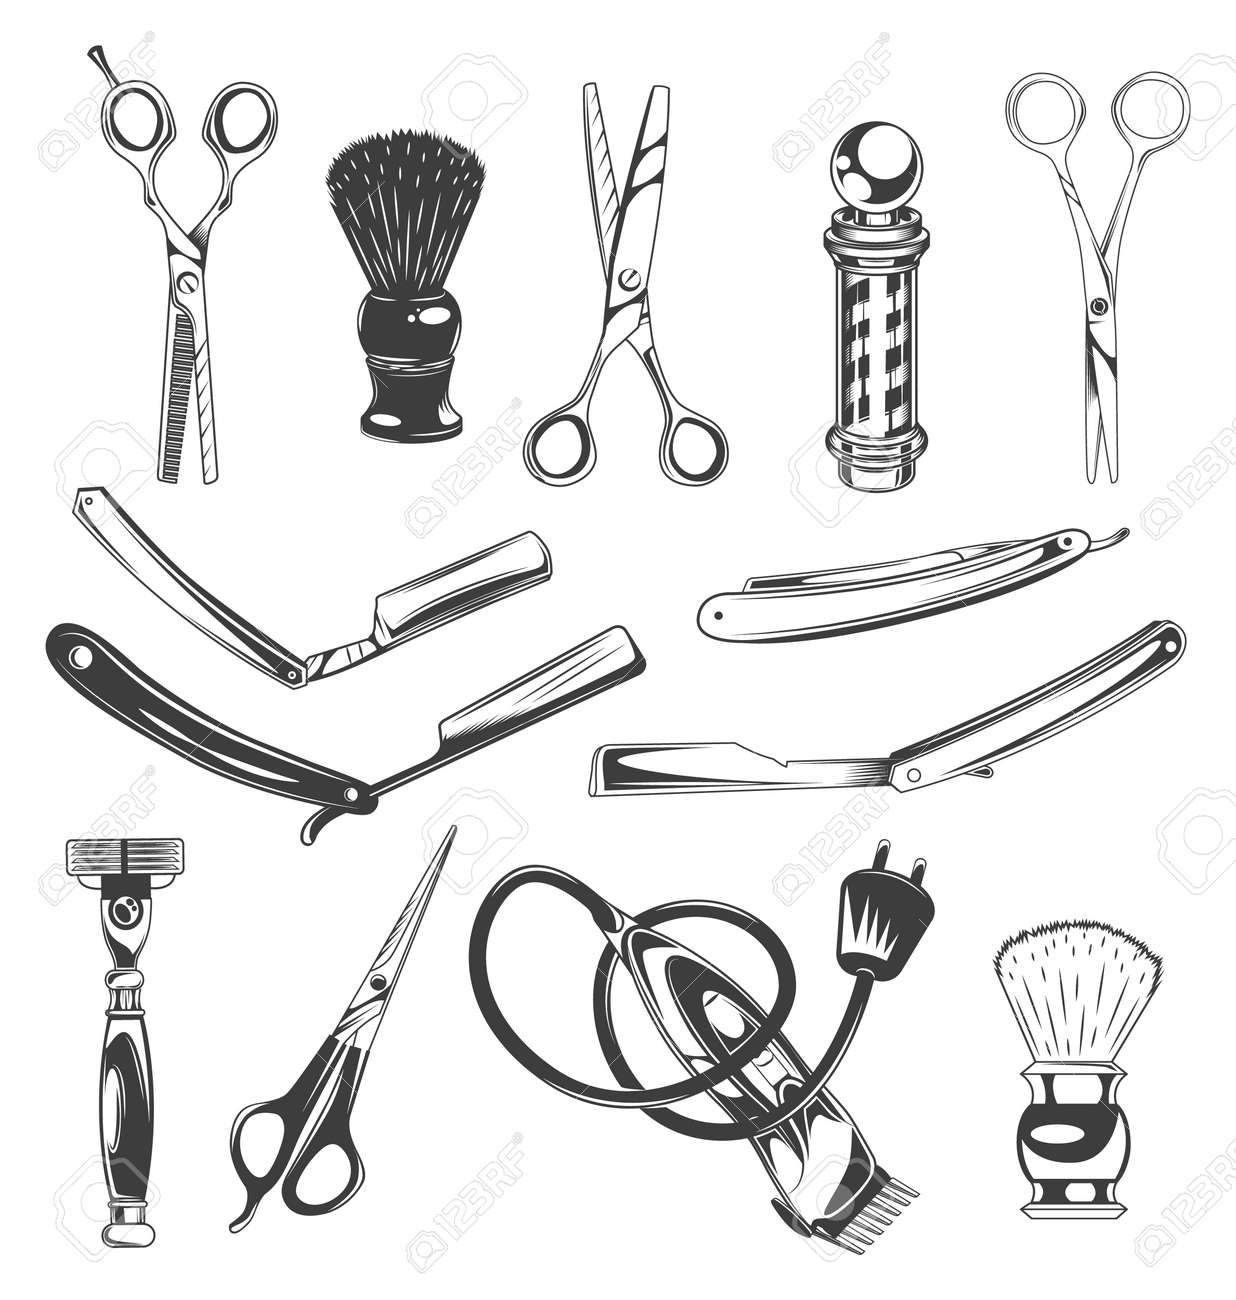 Set of barbershop tools, instruments, symbols. Different scissors for cutting hair, shaving brush, barber s pole, sharp razor blades for beard, shaver, electric razor. Barber professional equipment - 159903139